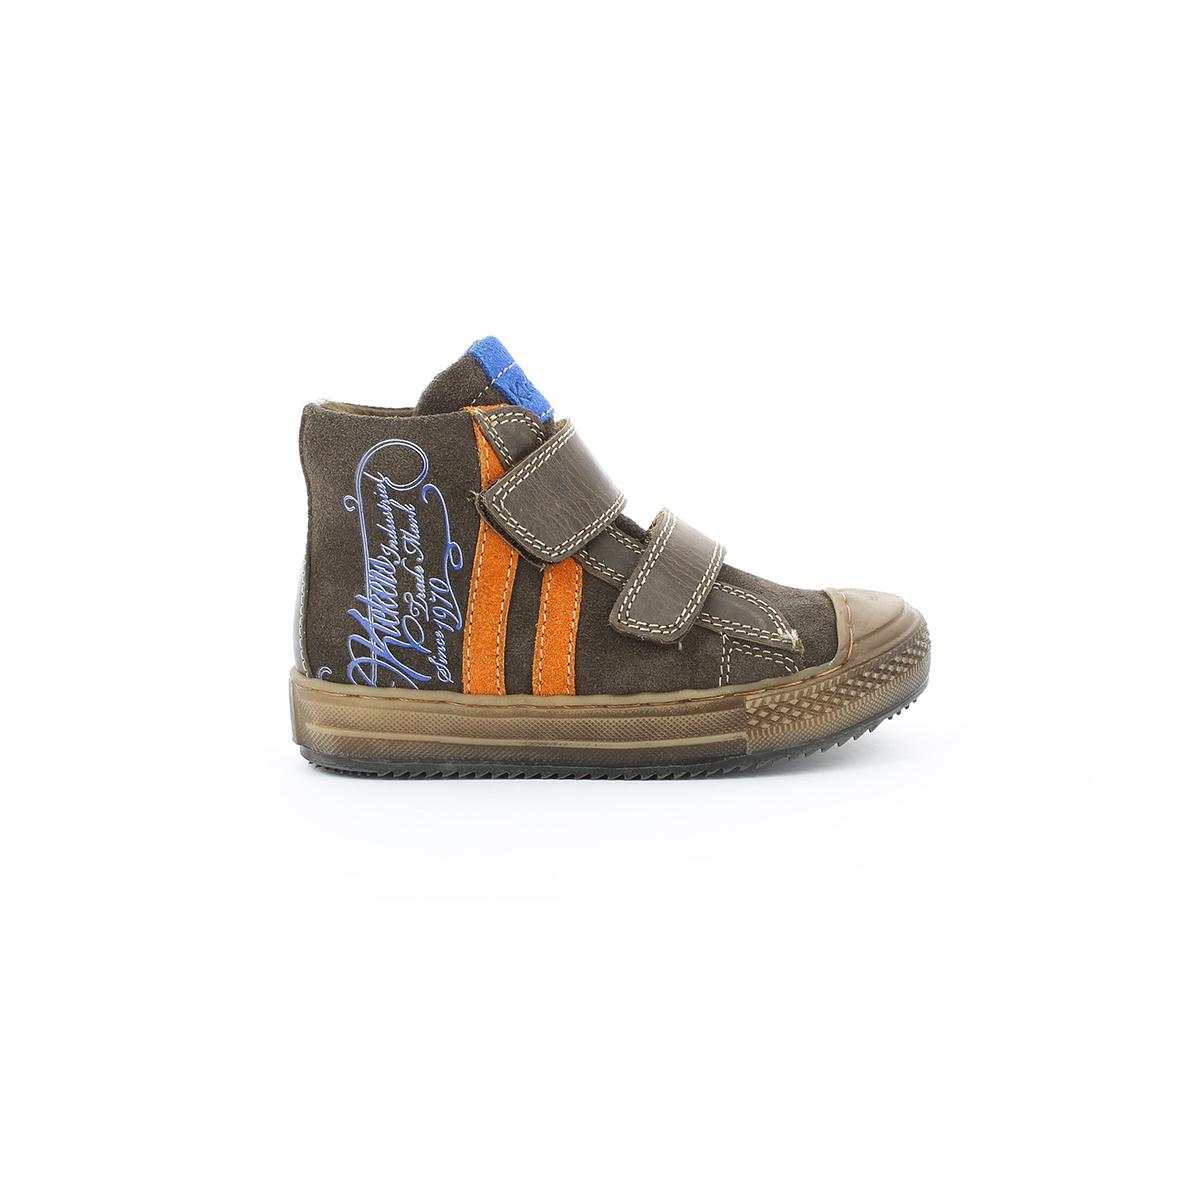 Kid's shoes BARCALU BROWN Kickers